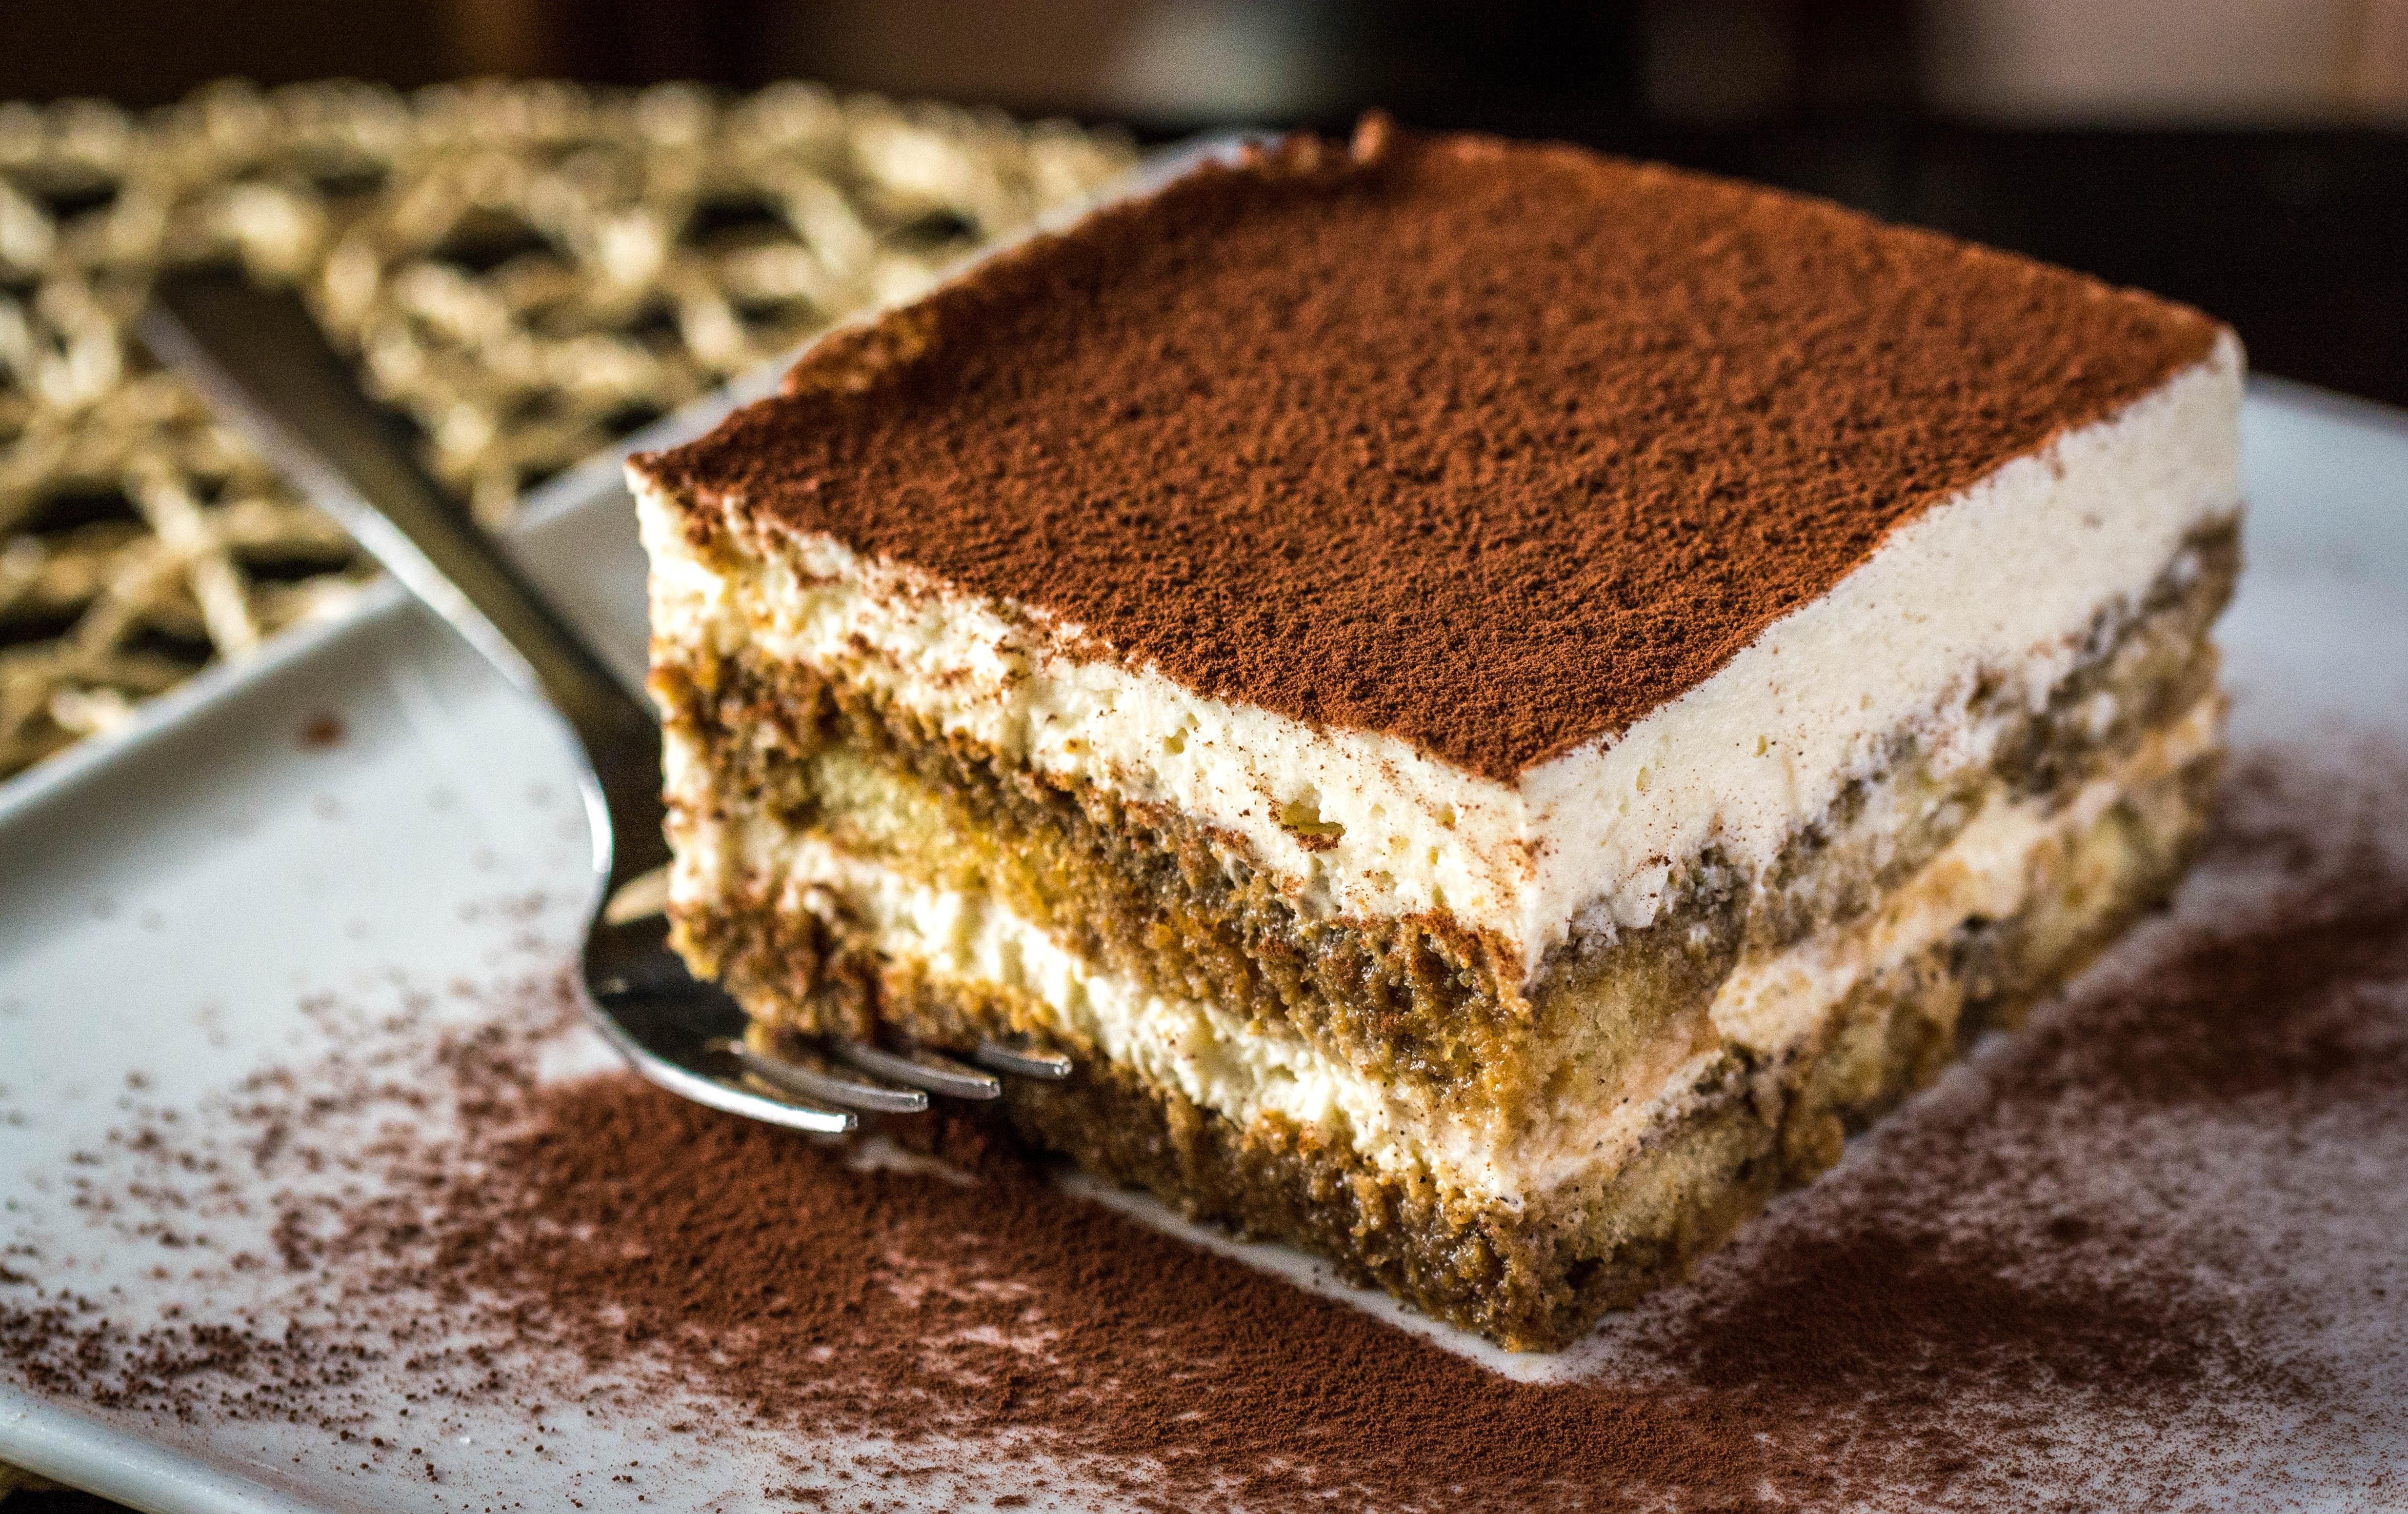 Italian tiramisu dessert